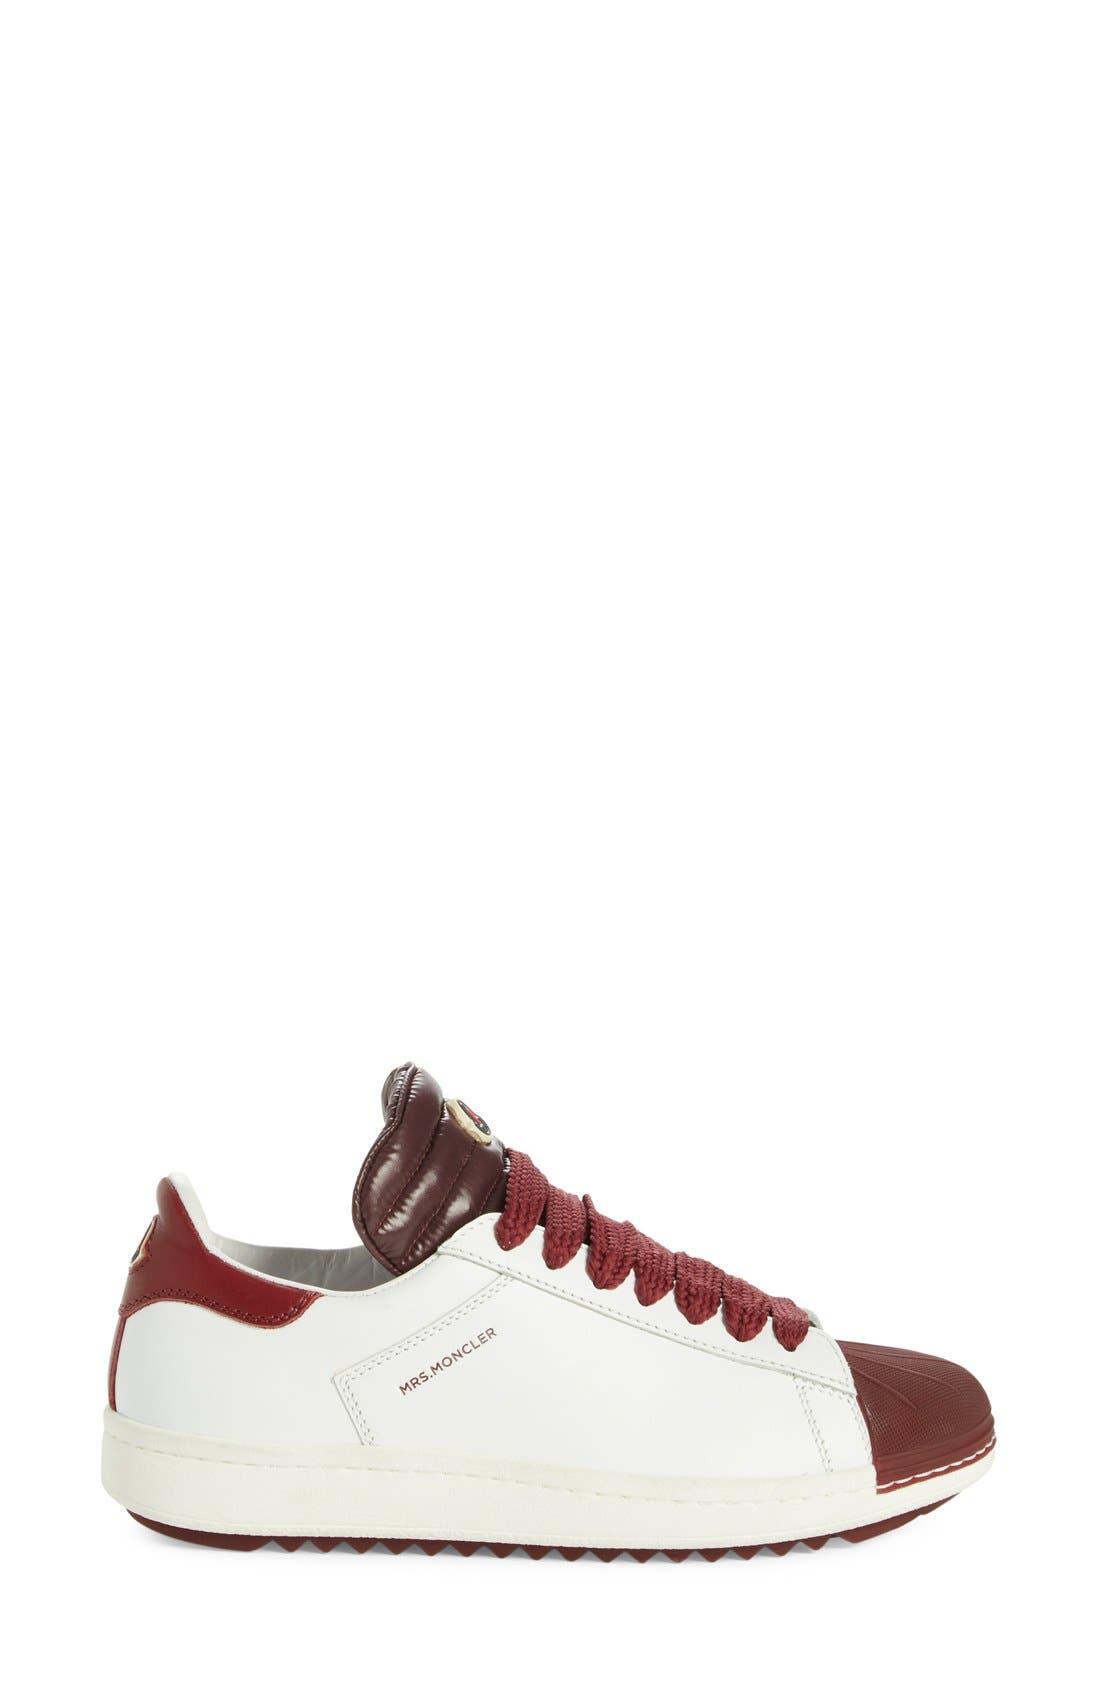 'Angeline Scarpa' Sneaker,                             Alternate thumbnail 8, color,